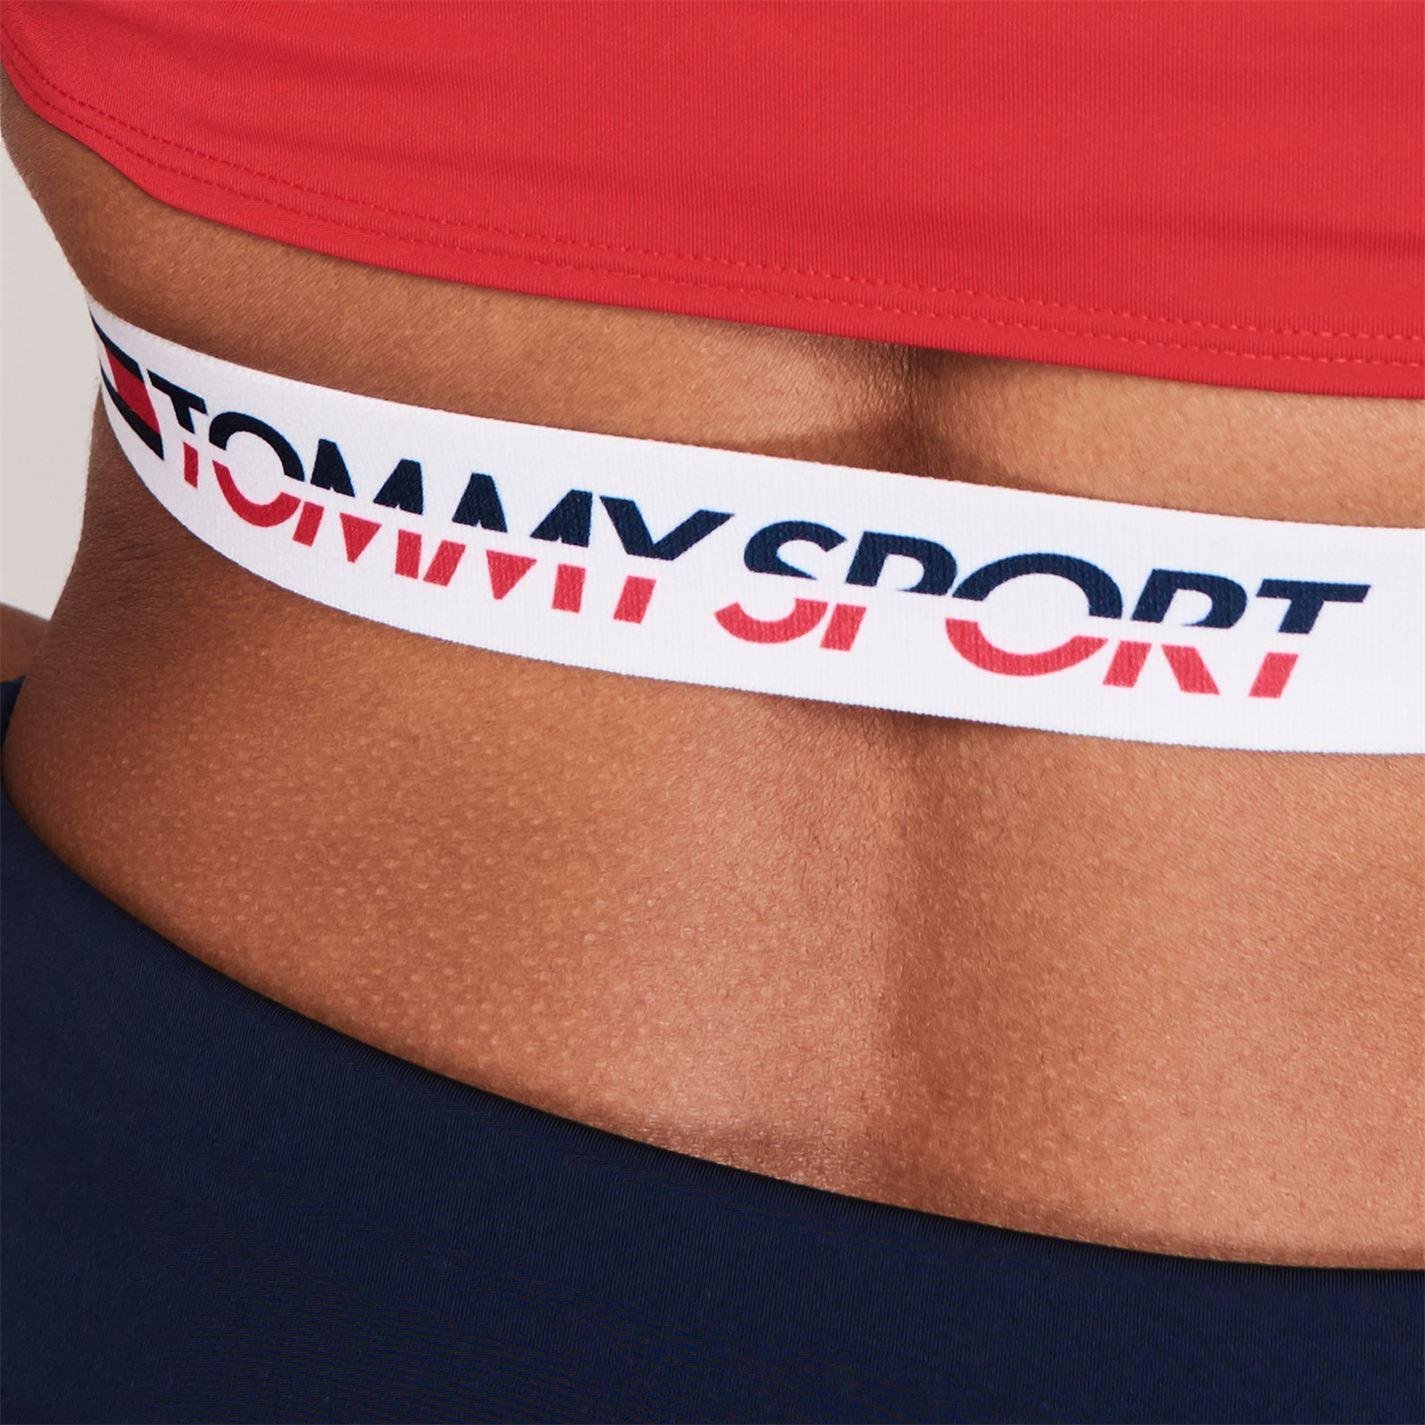 Top scurt Tommy Sport true rosu